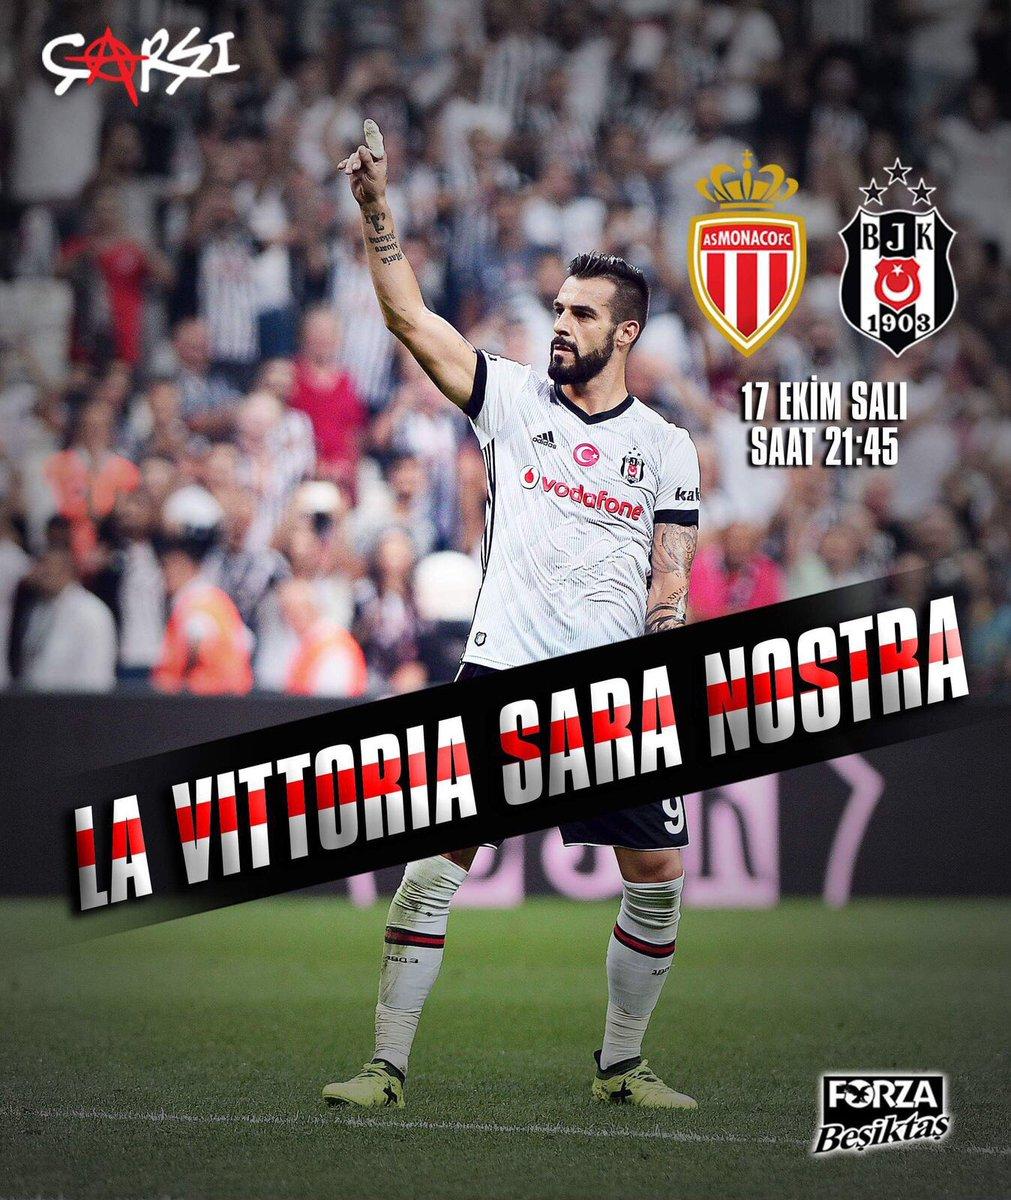 Zafer bizim olacak... #Beşiktaş #UCL htt...